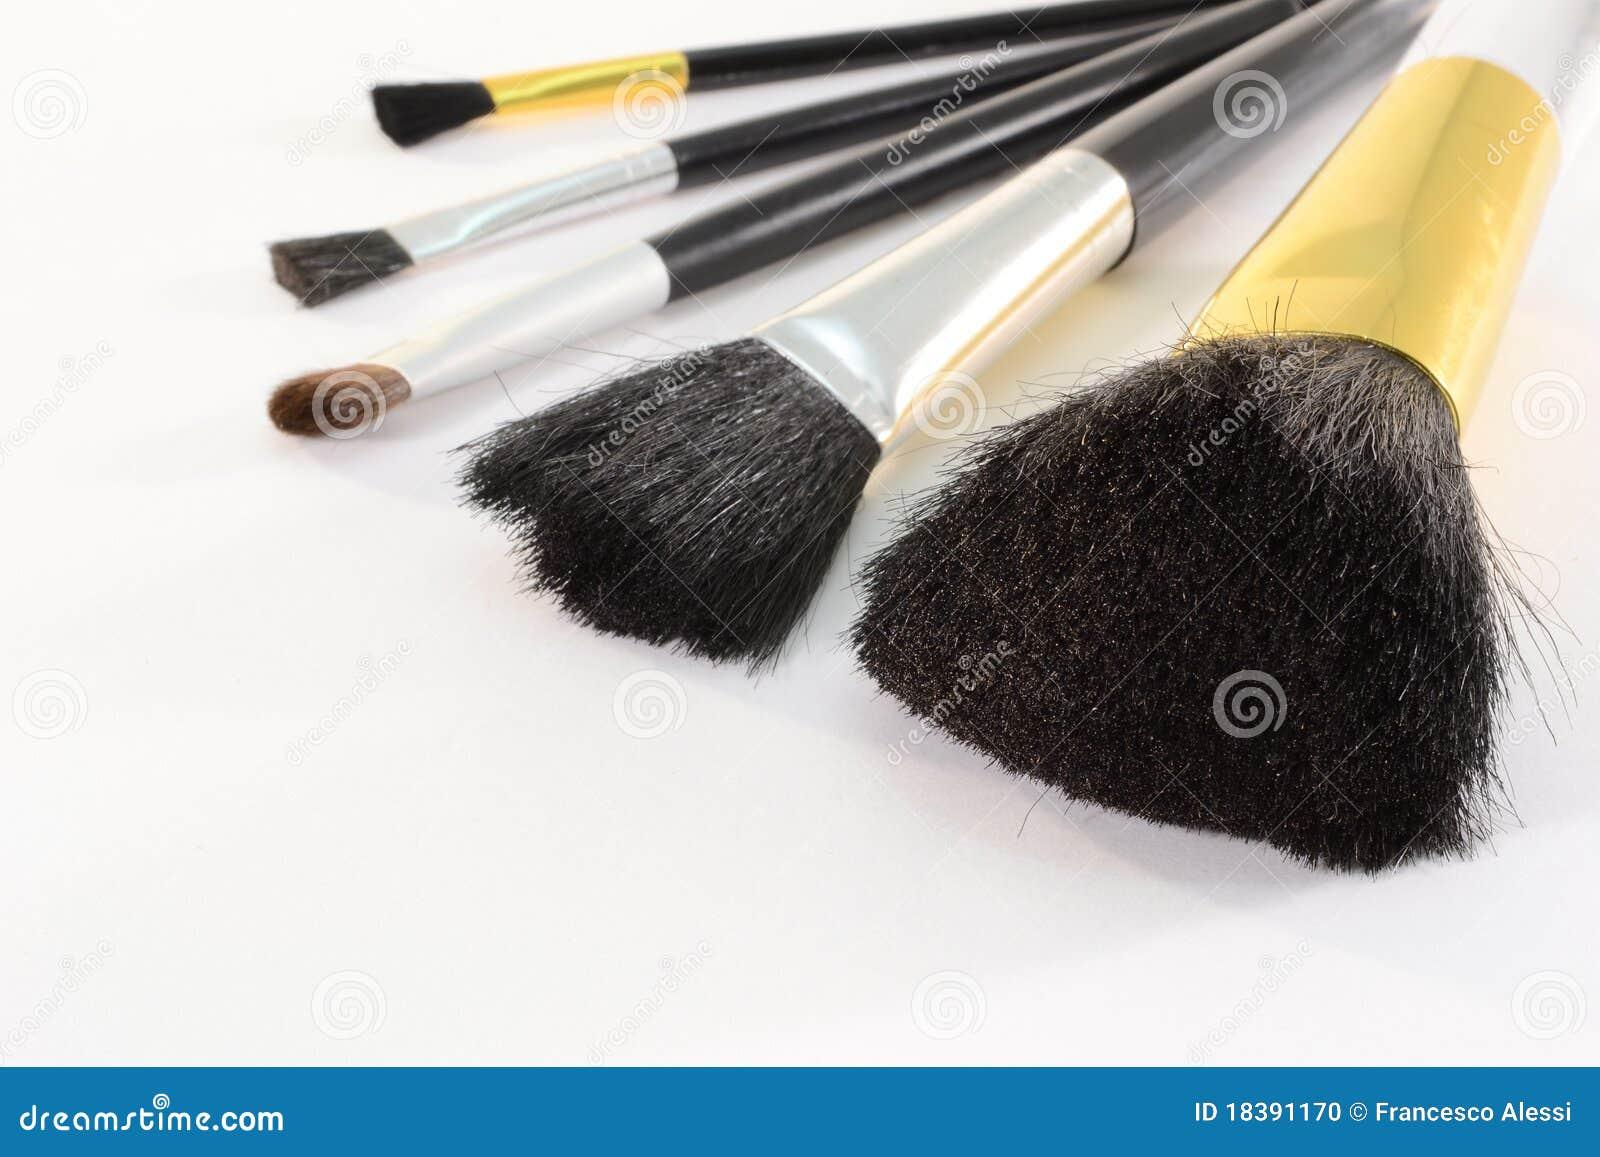 чистит косметику щеткой